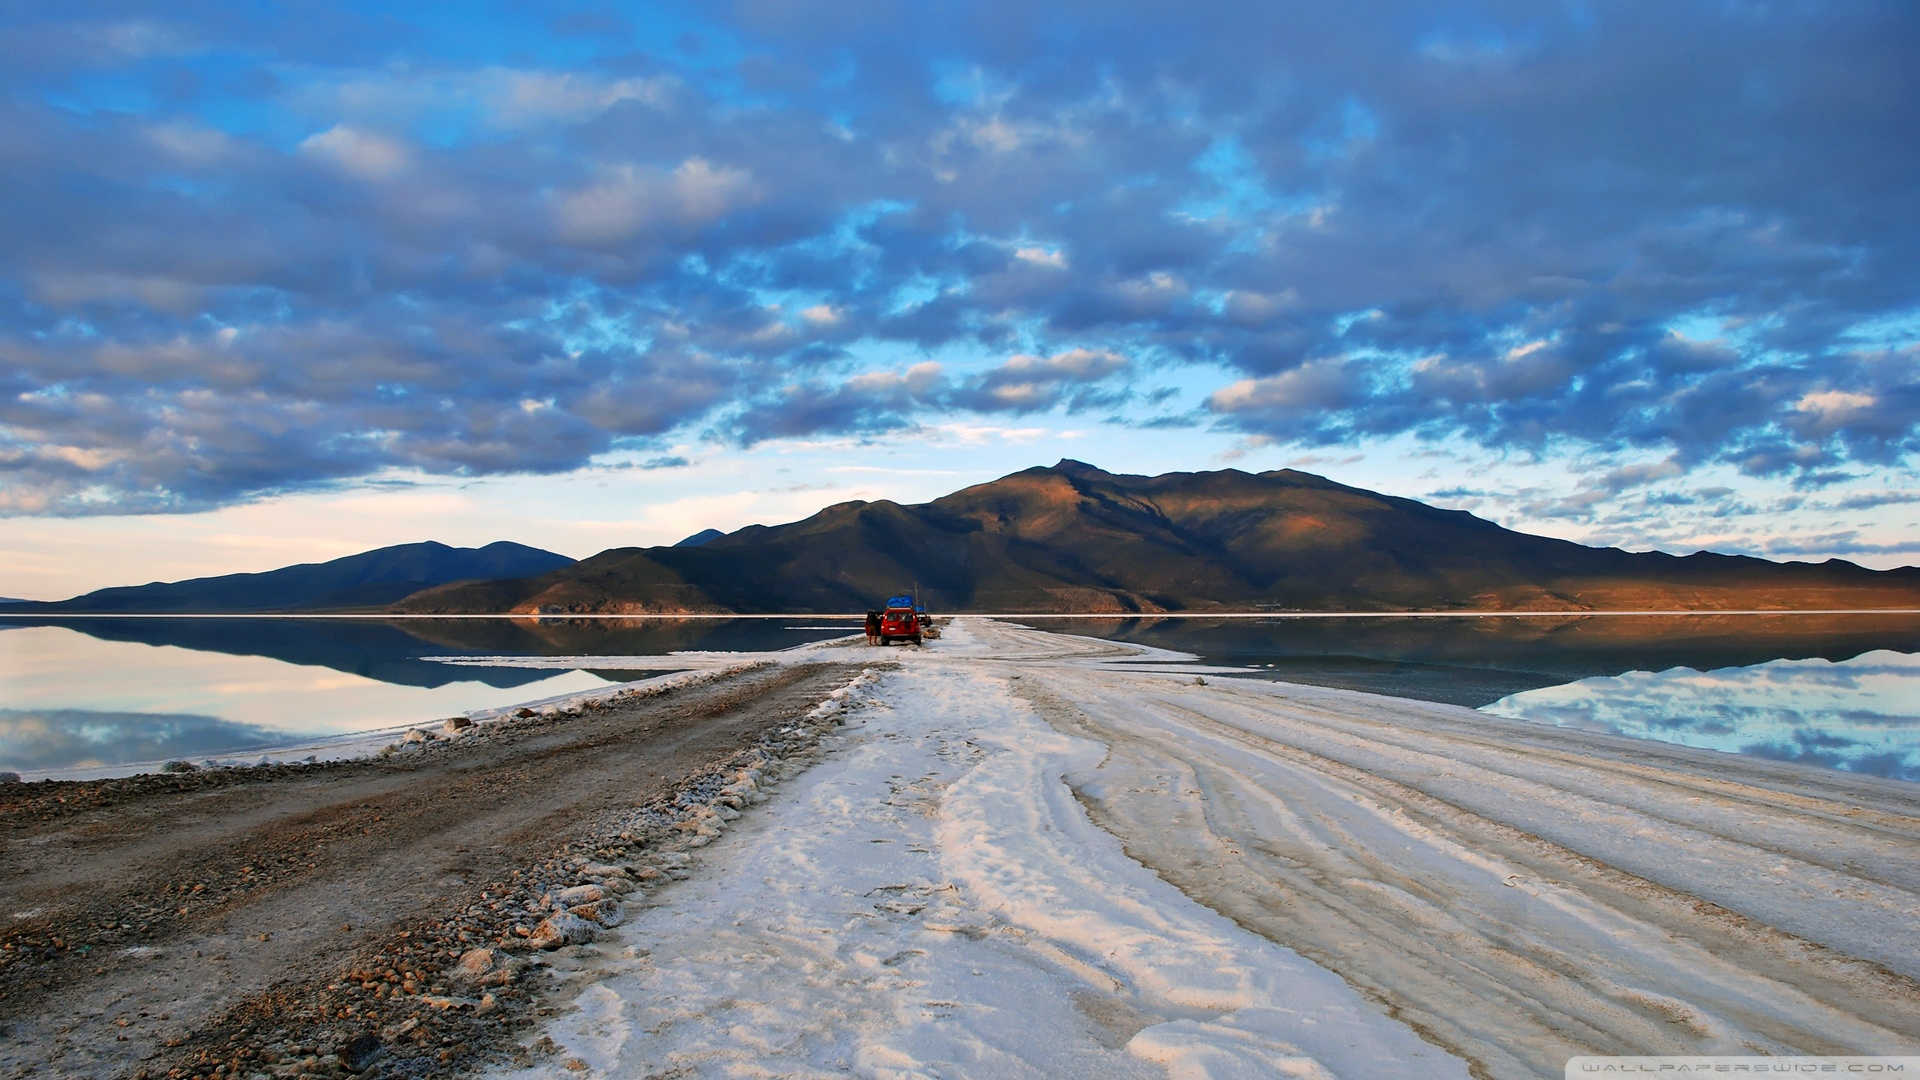 Salar De Uyuni Salt Desert Bolivia 4K HD Desktop Wallpaper for 1920x1080